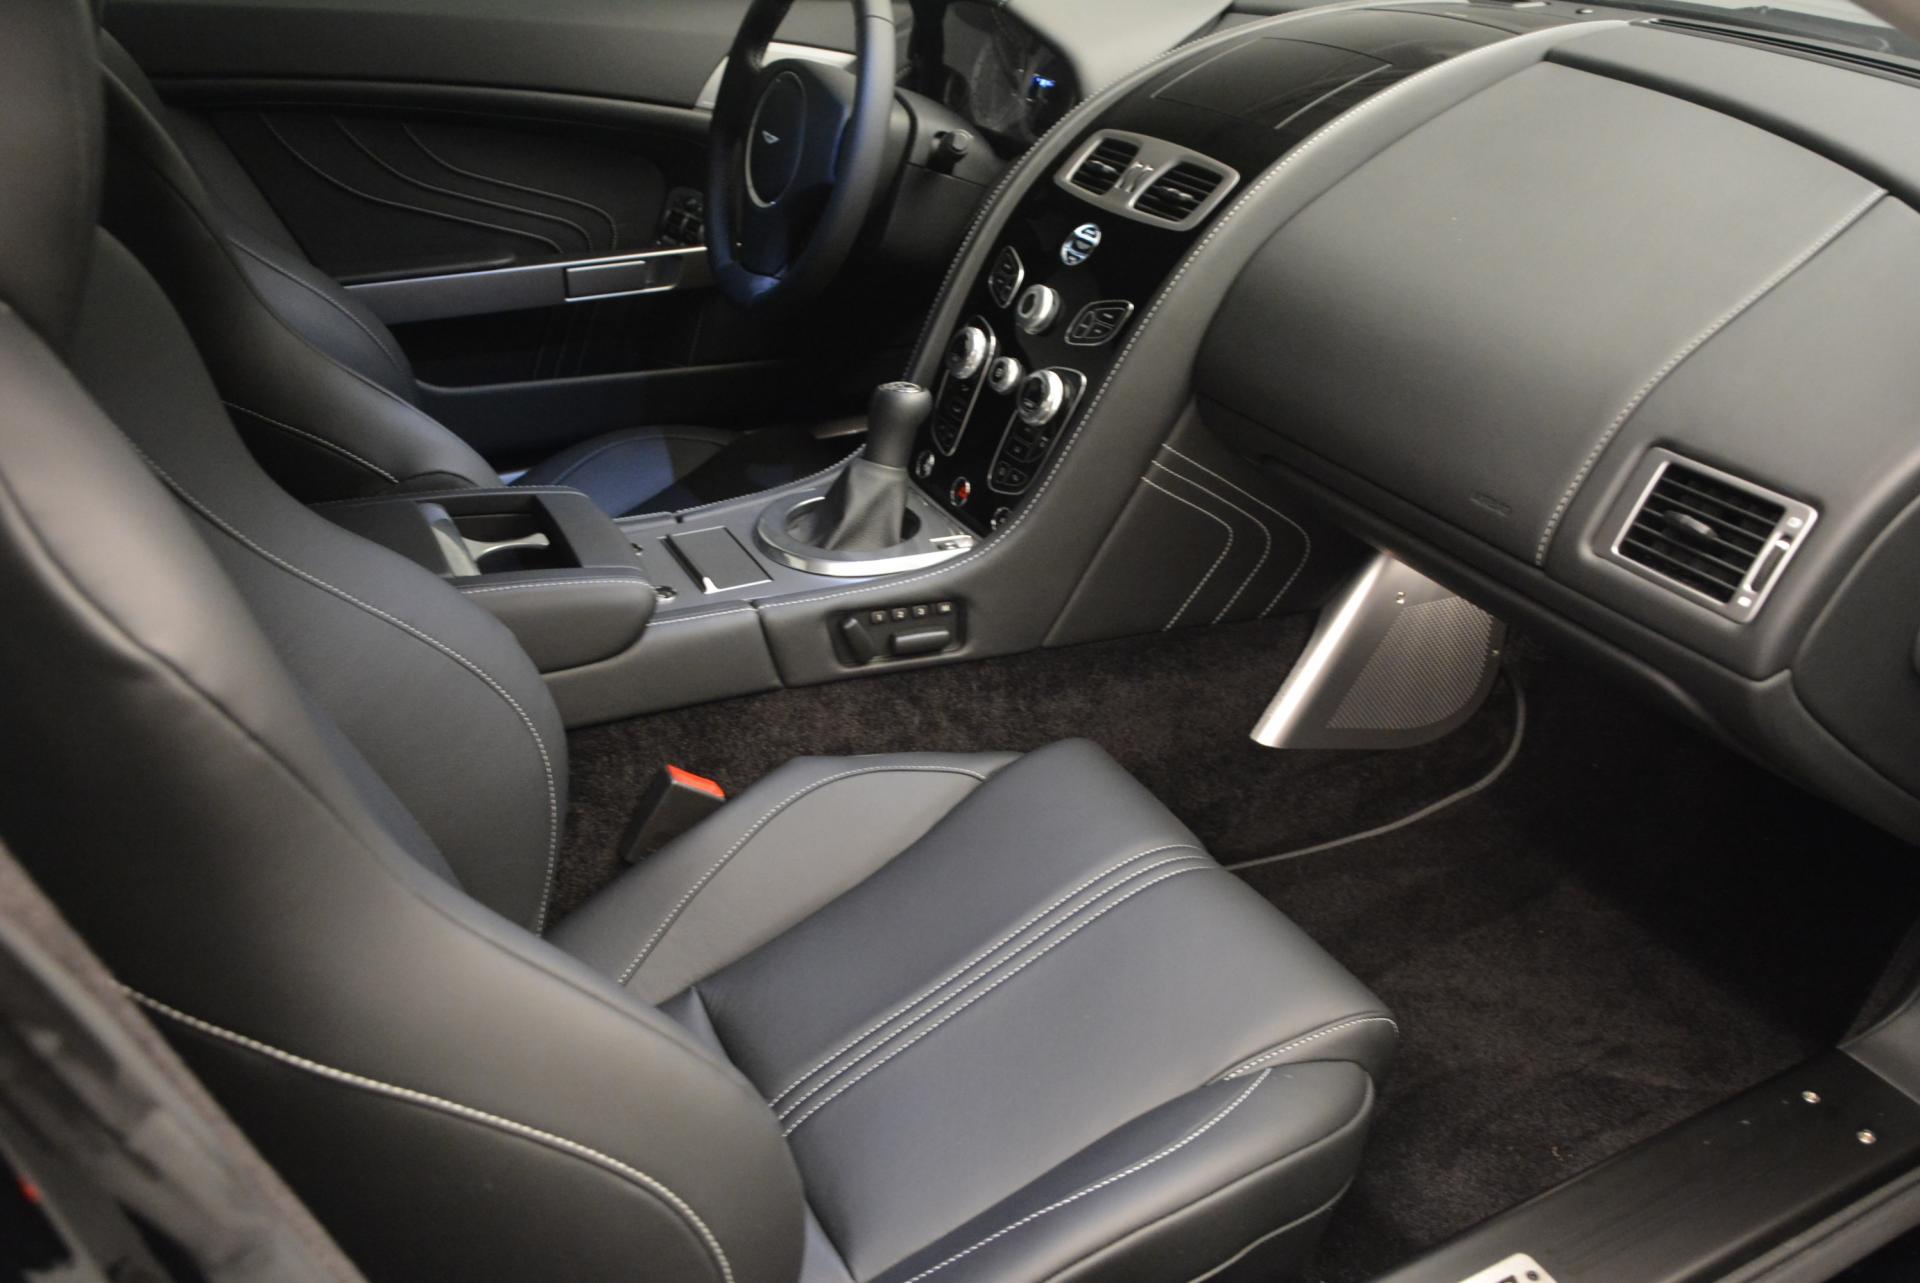 New 2016 Aston Martin V8 Vantage GTS S For Sale In Westport, CT 526_p18